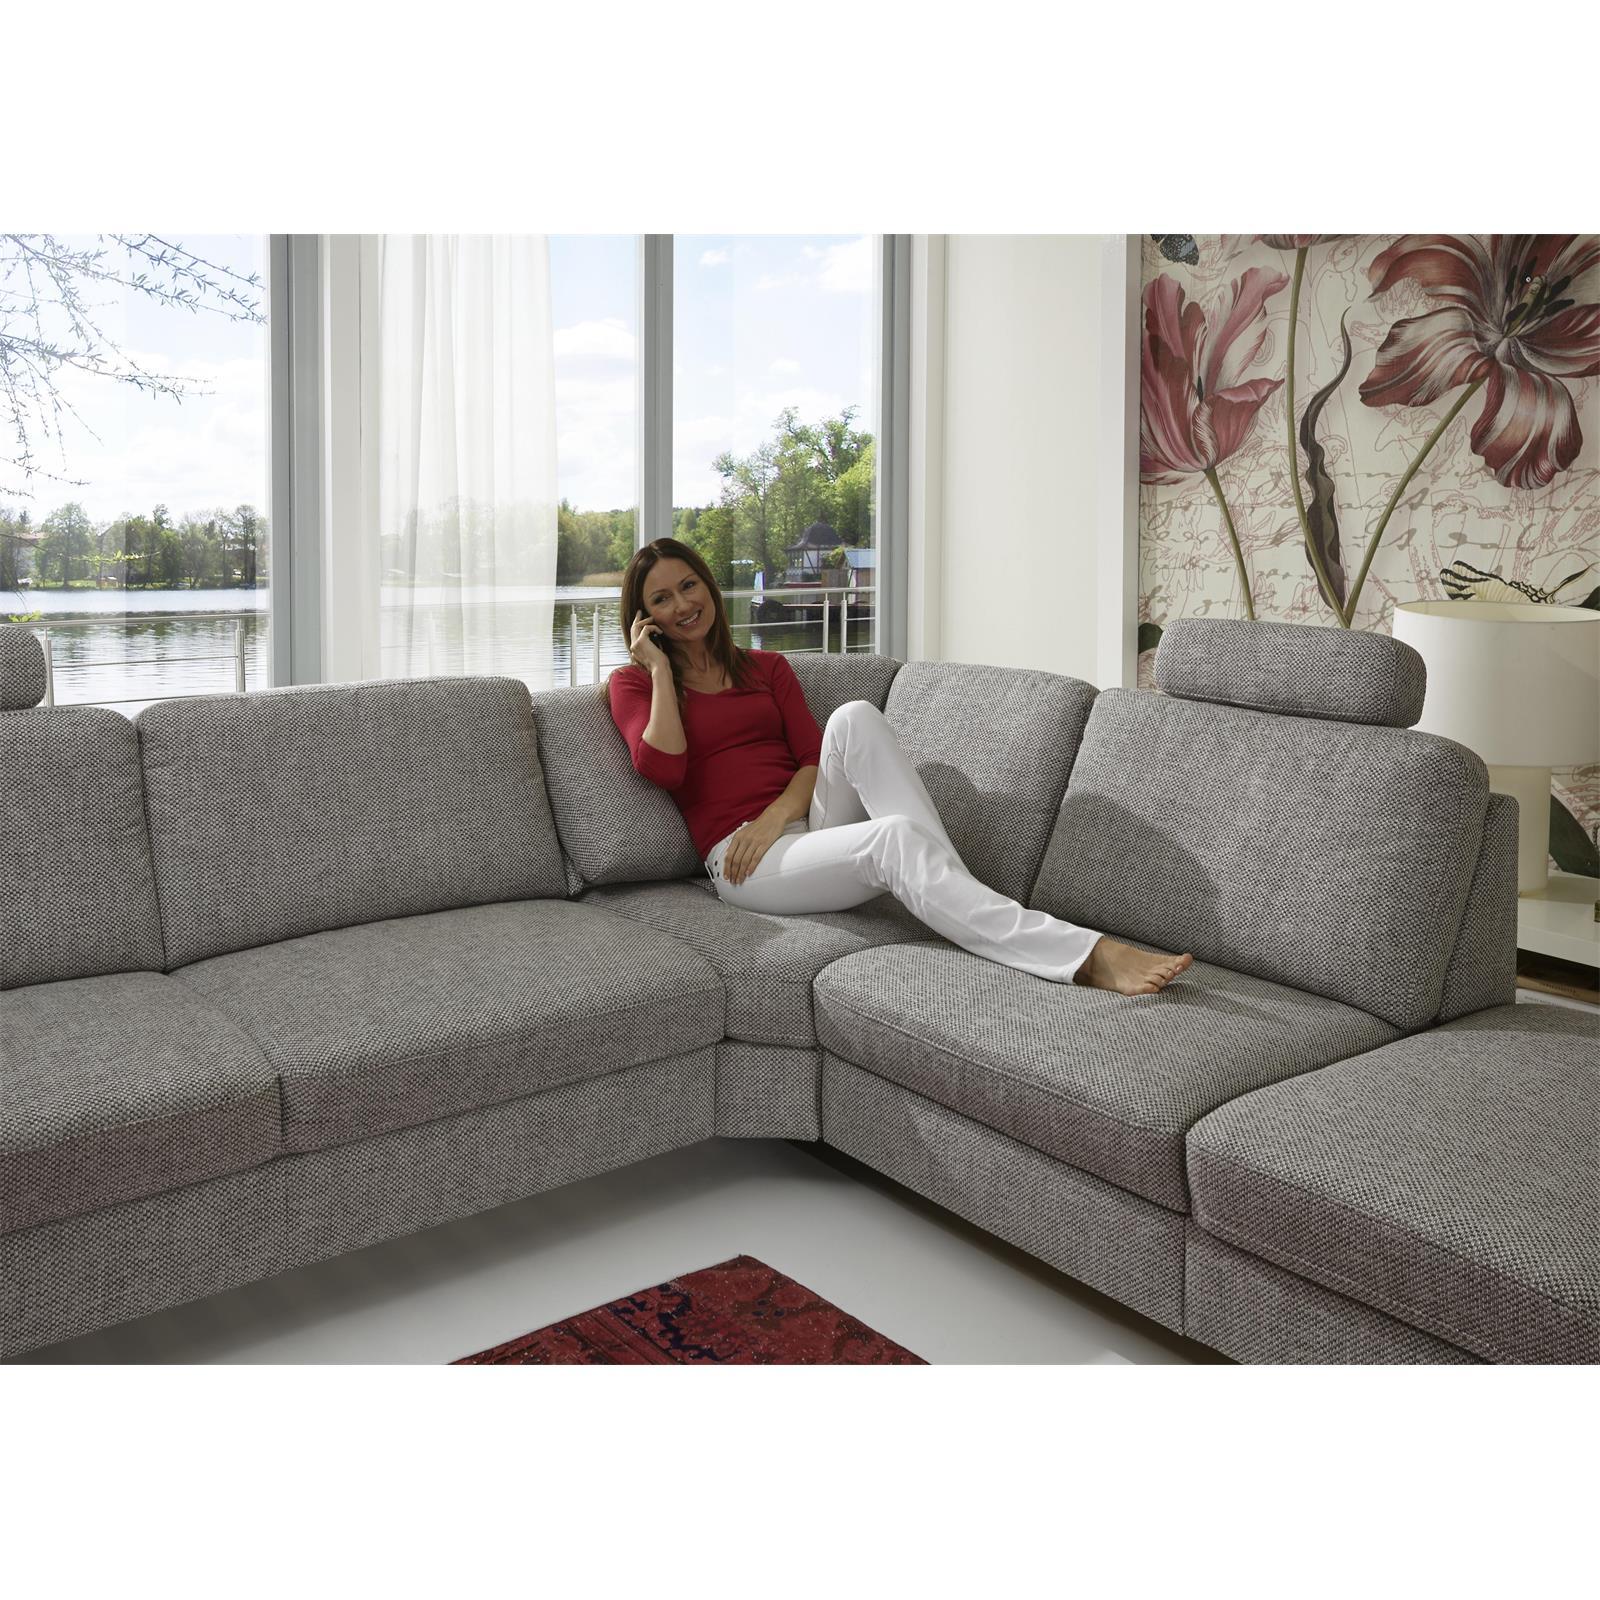 rico polsterecke justhome rico ecksofa polsterecke. Black Bedroom Furniture Sets. Home Design Ideas